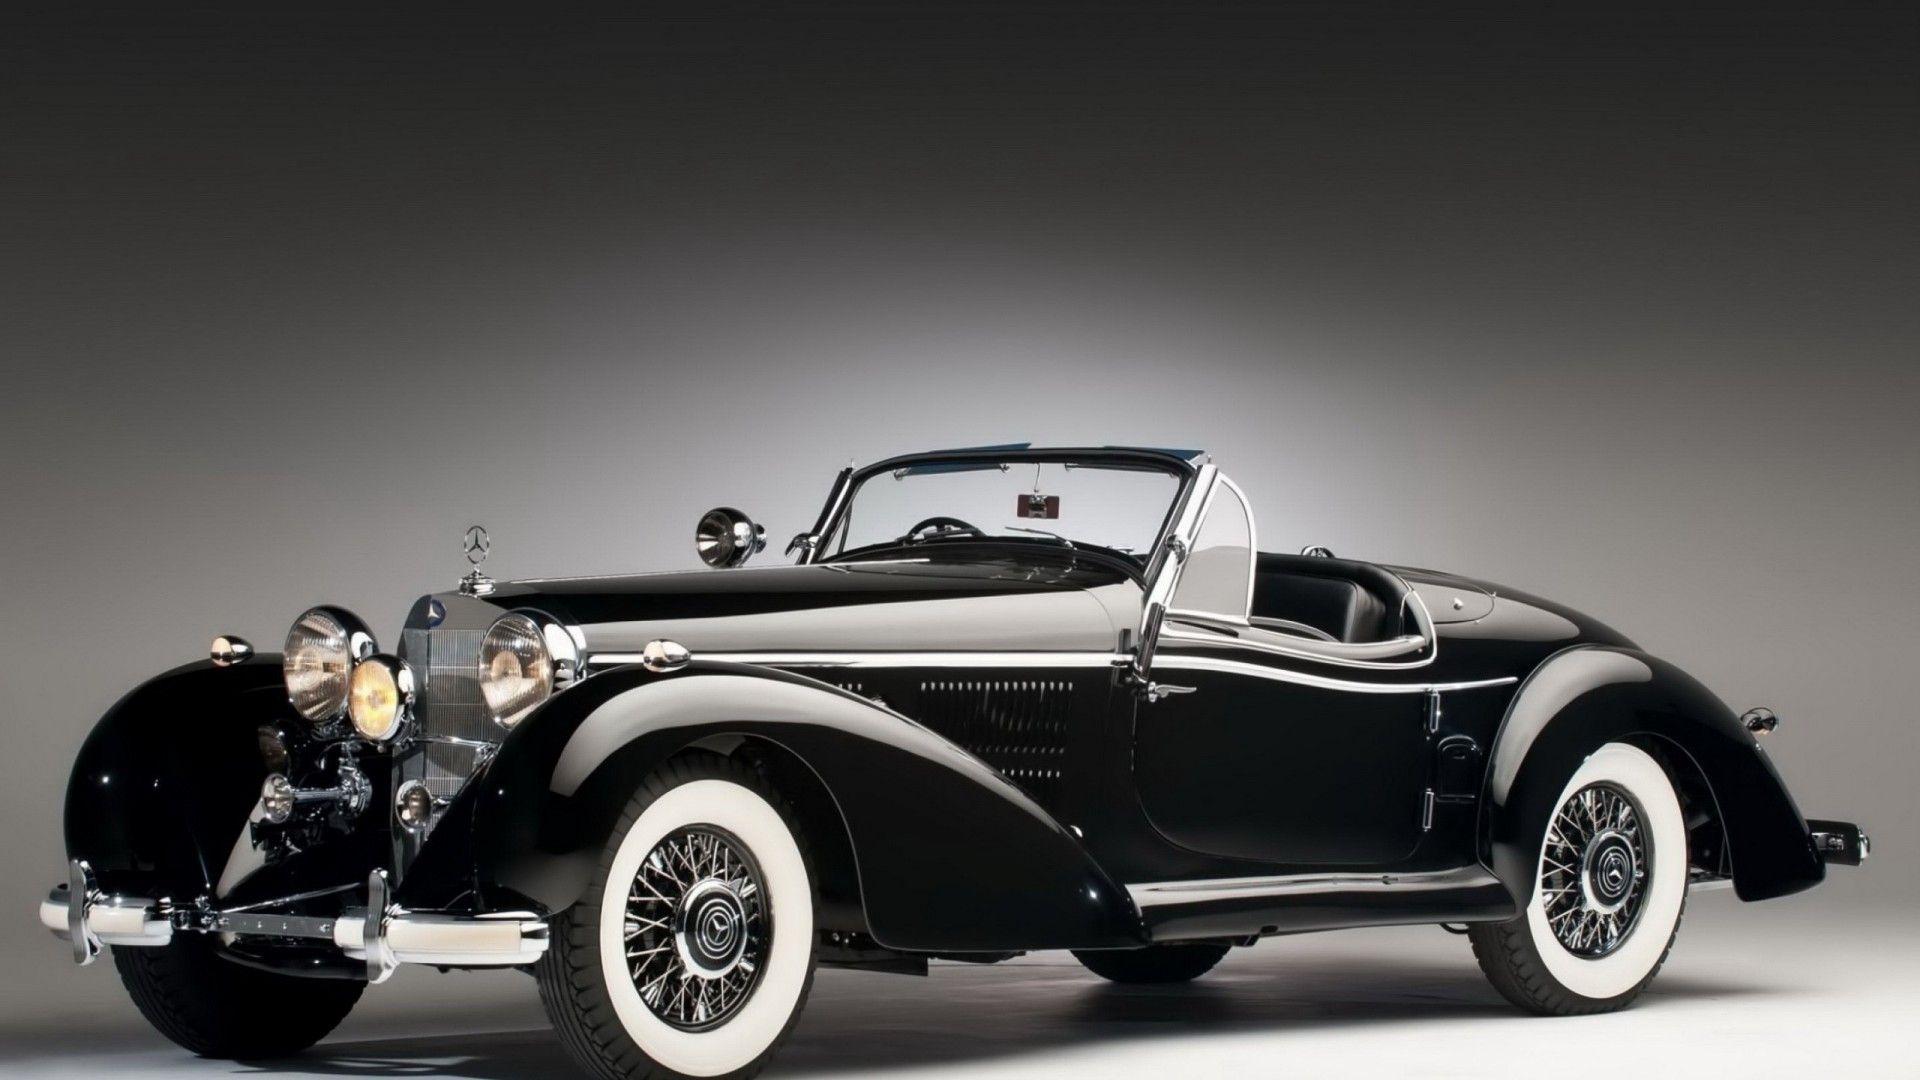 Vintage Cars Wallpapers Best Wallpapers Classic Cars Vintage Retro Cars Wallpaper Mercedes Benz